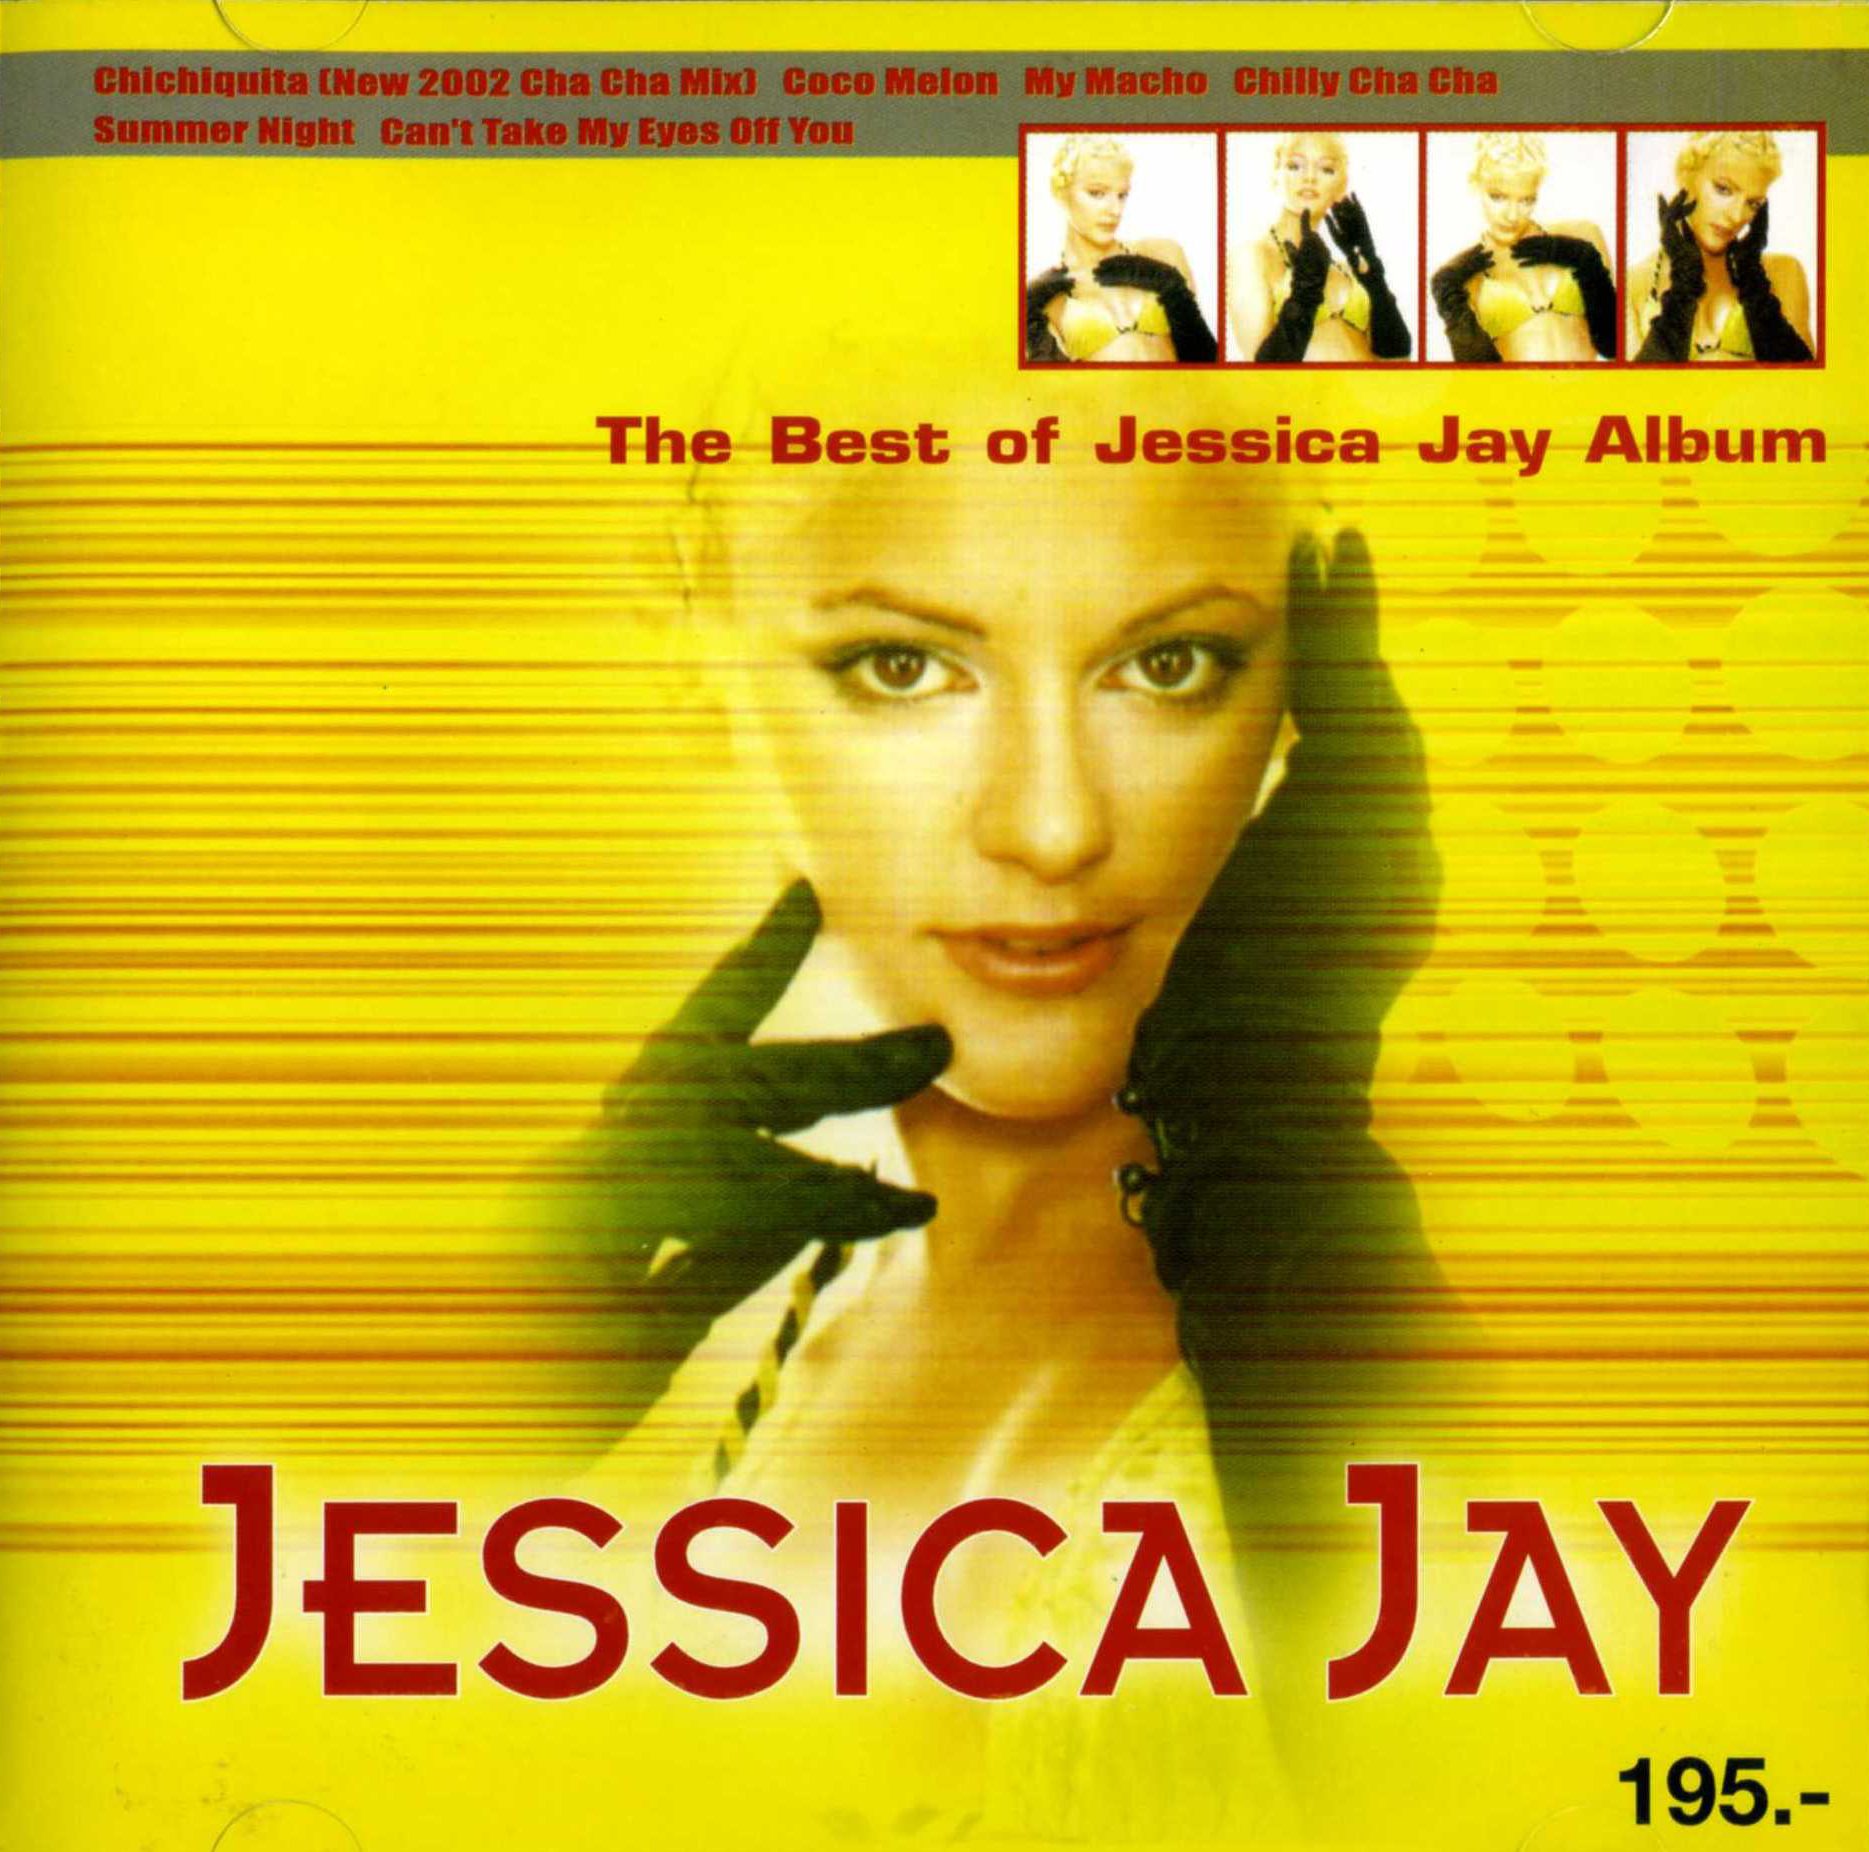 Album The Best Of Jessica Jay (2002) – Jessica Jay